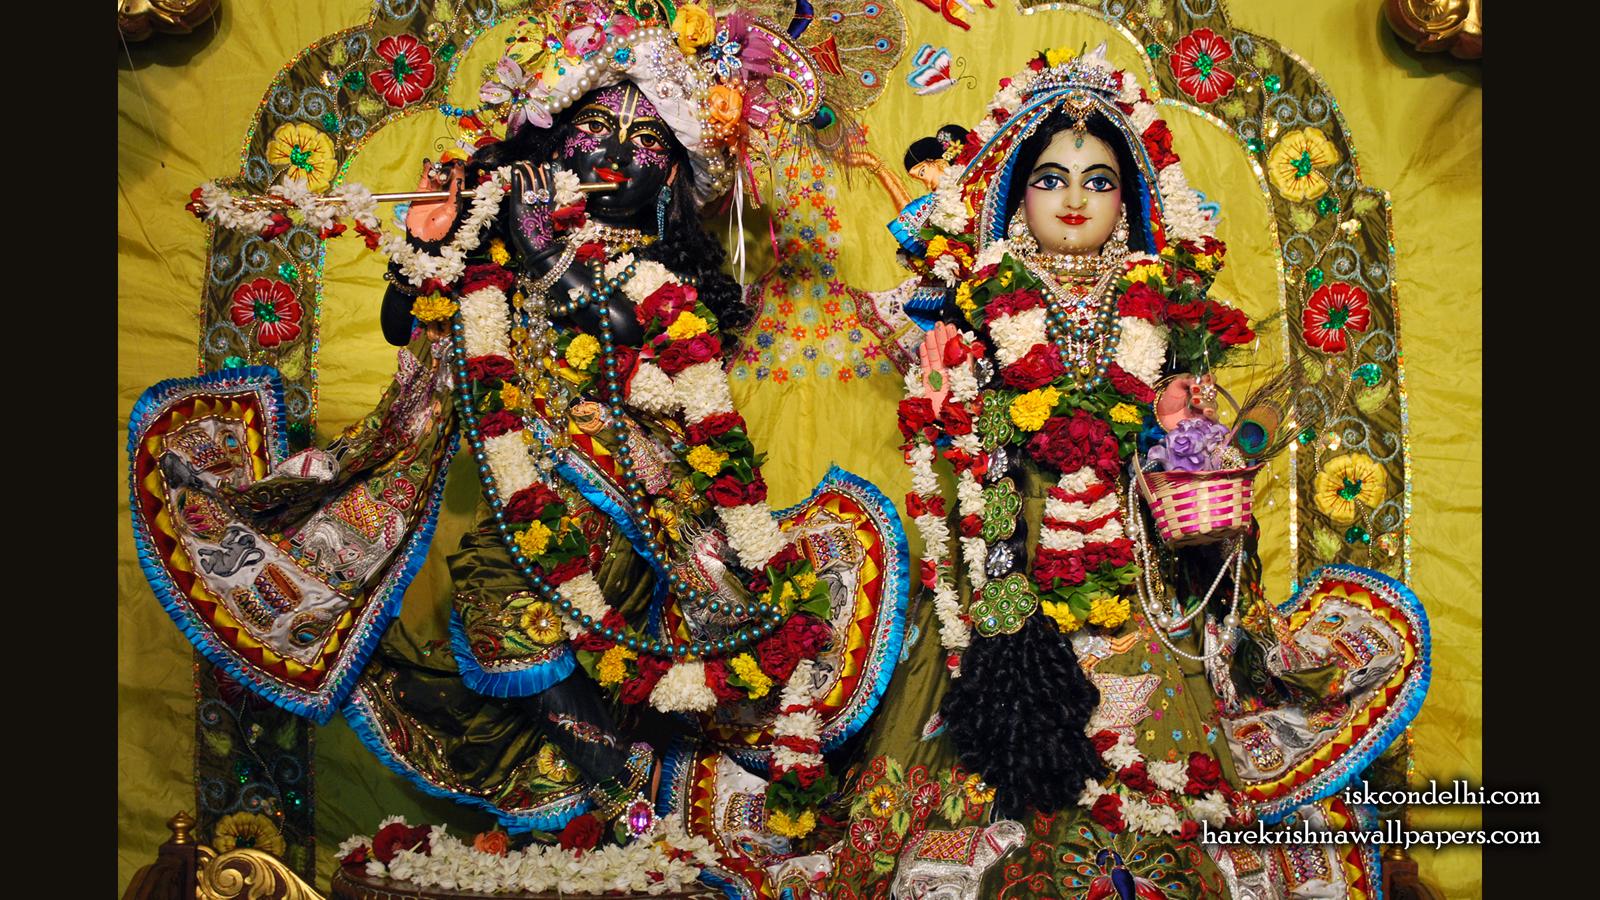 Sri Sri Radha Parthasarathi Wallpaper (007) Size 1600x900 Download